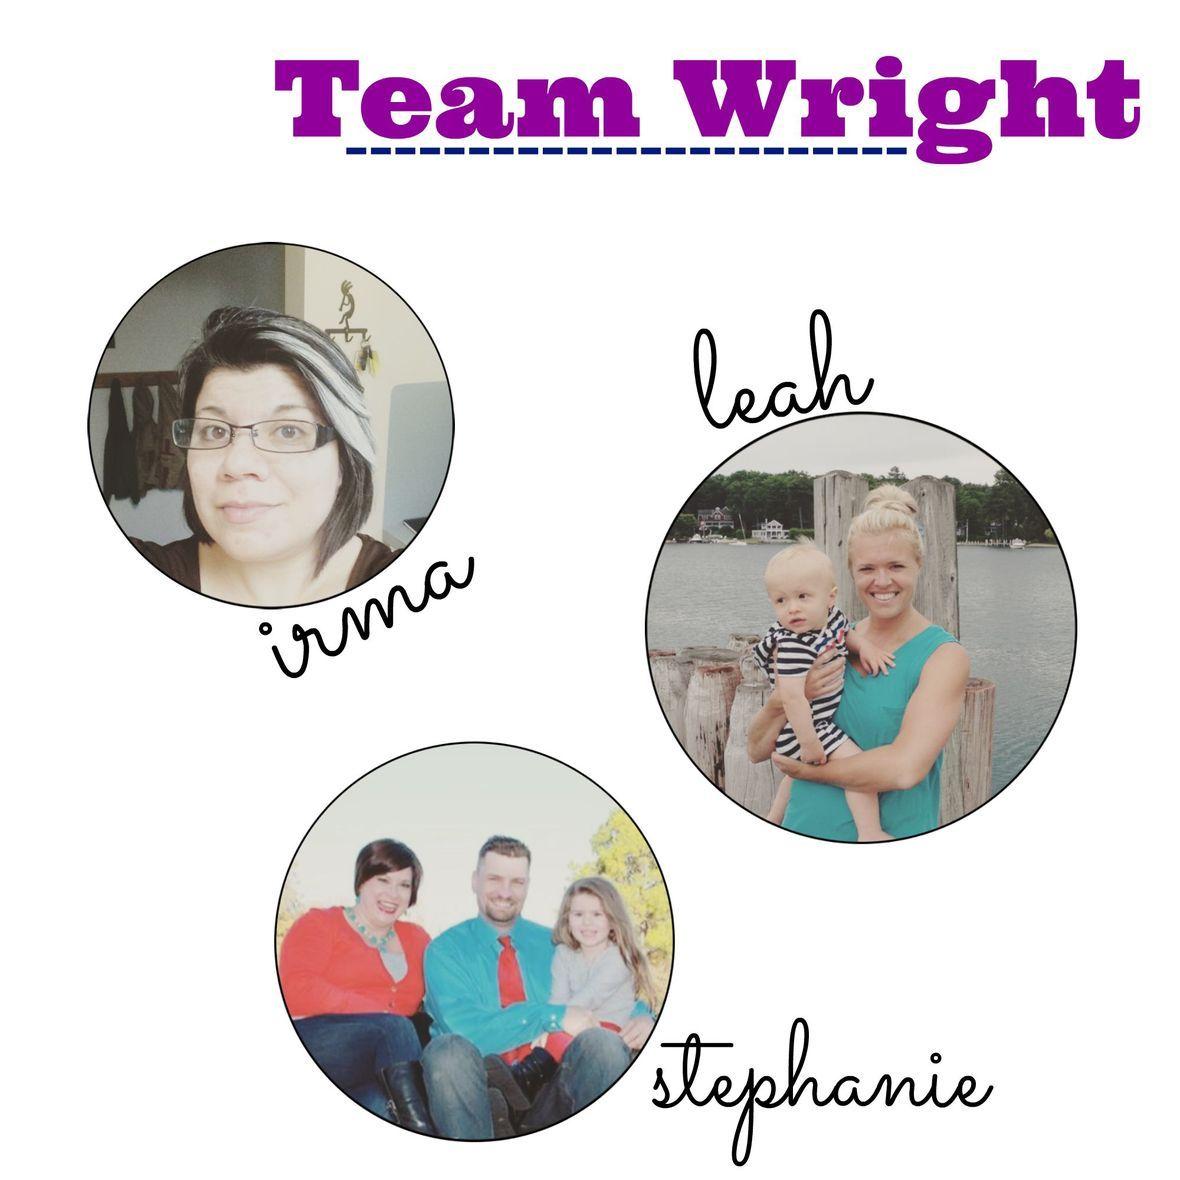 team wright